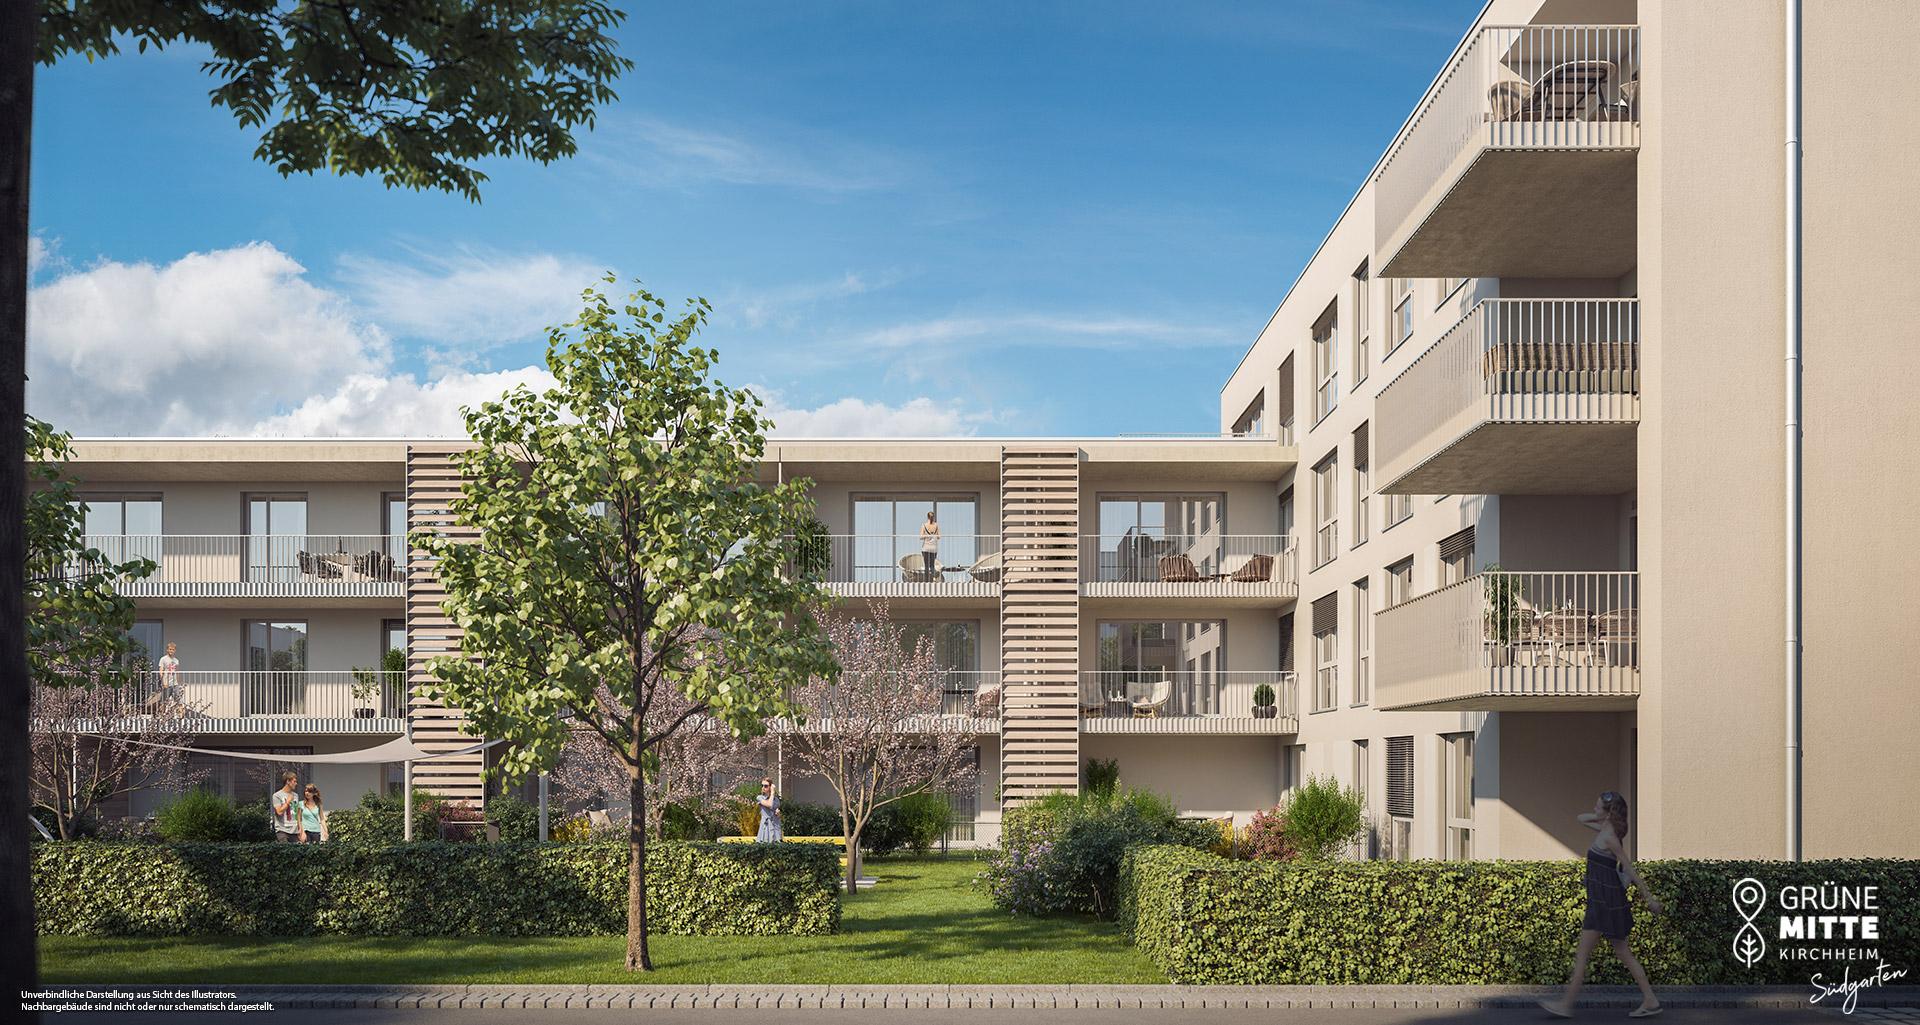 Condominiums Kirchheim bei munich: Grüne Mitte Kirchheim - Suedgarten